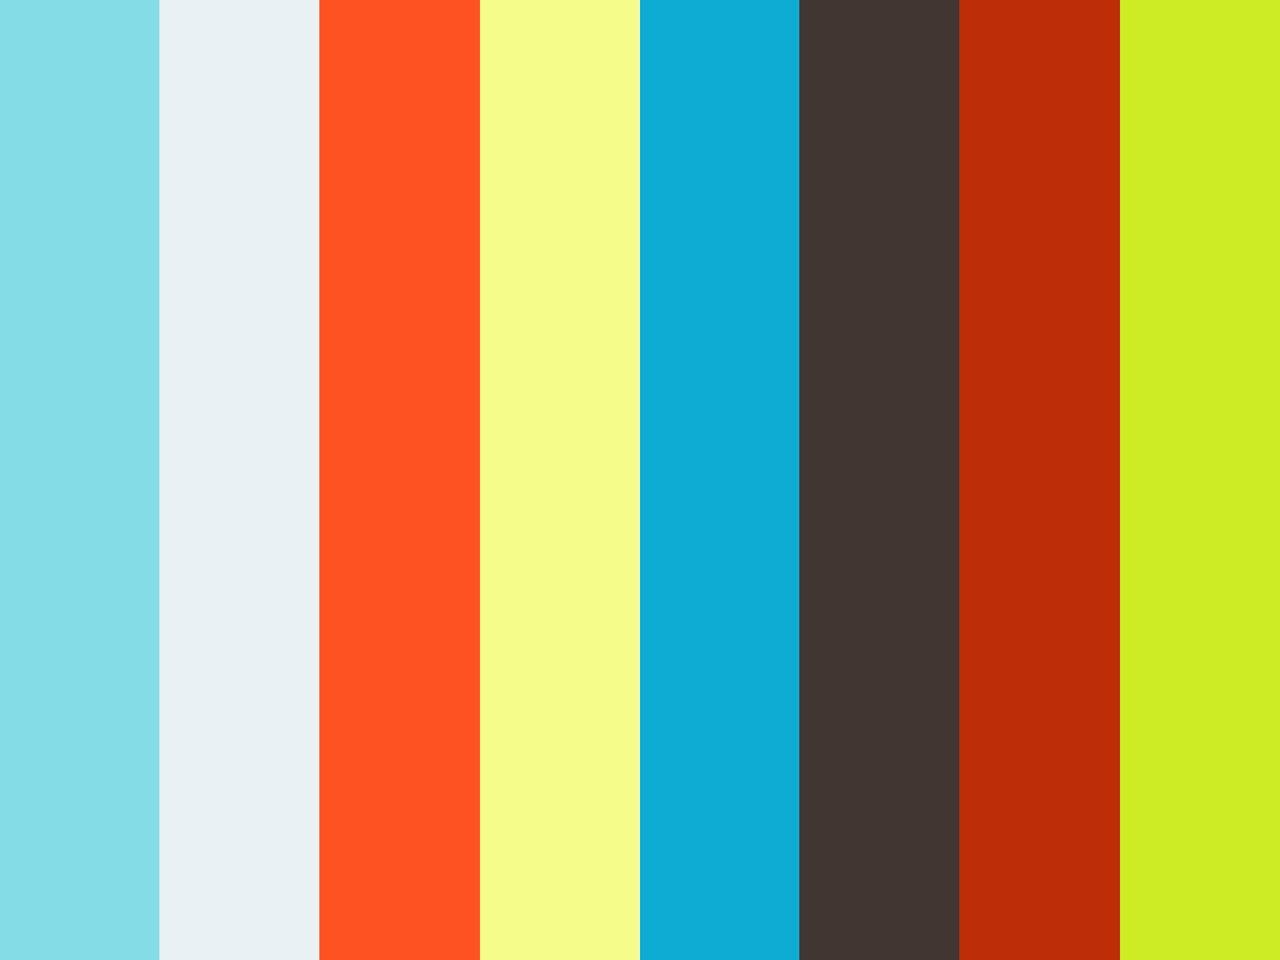 52-2016.12.25-Blue & Virginia︱高雄岡山東區海口味庭園餐廳︱當日快剪快播SDE